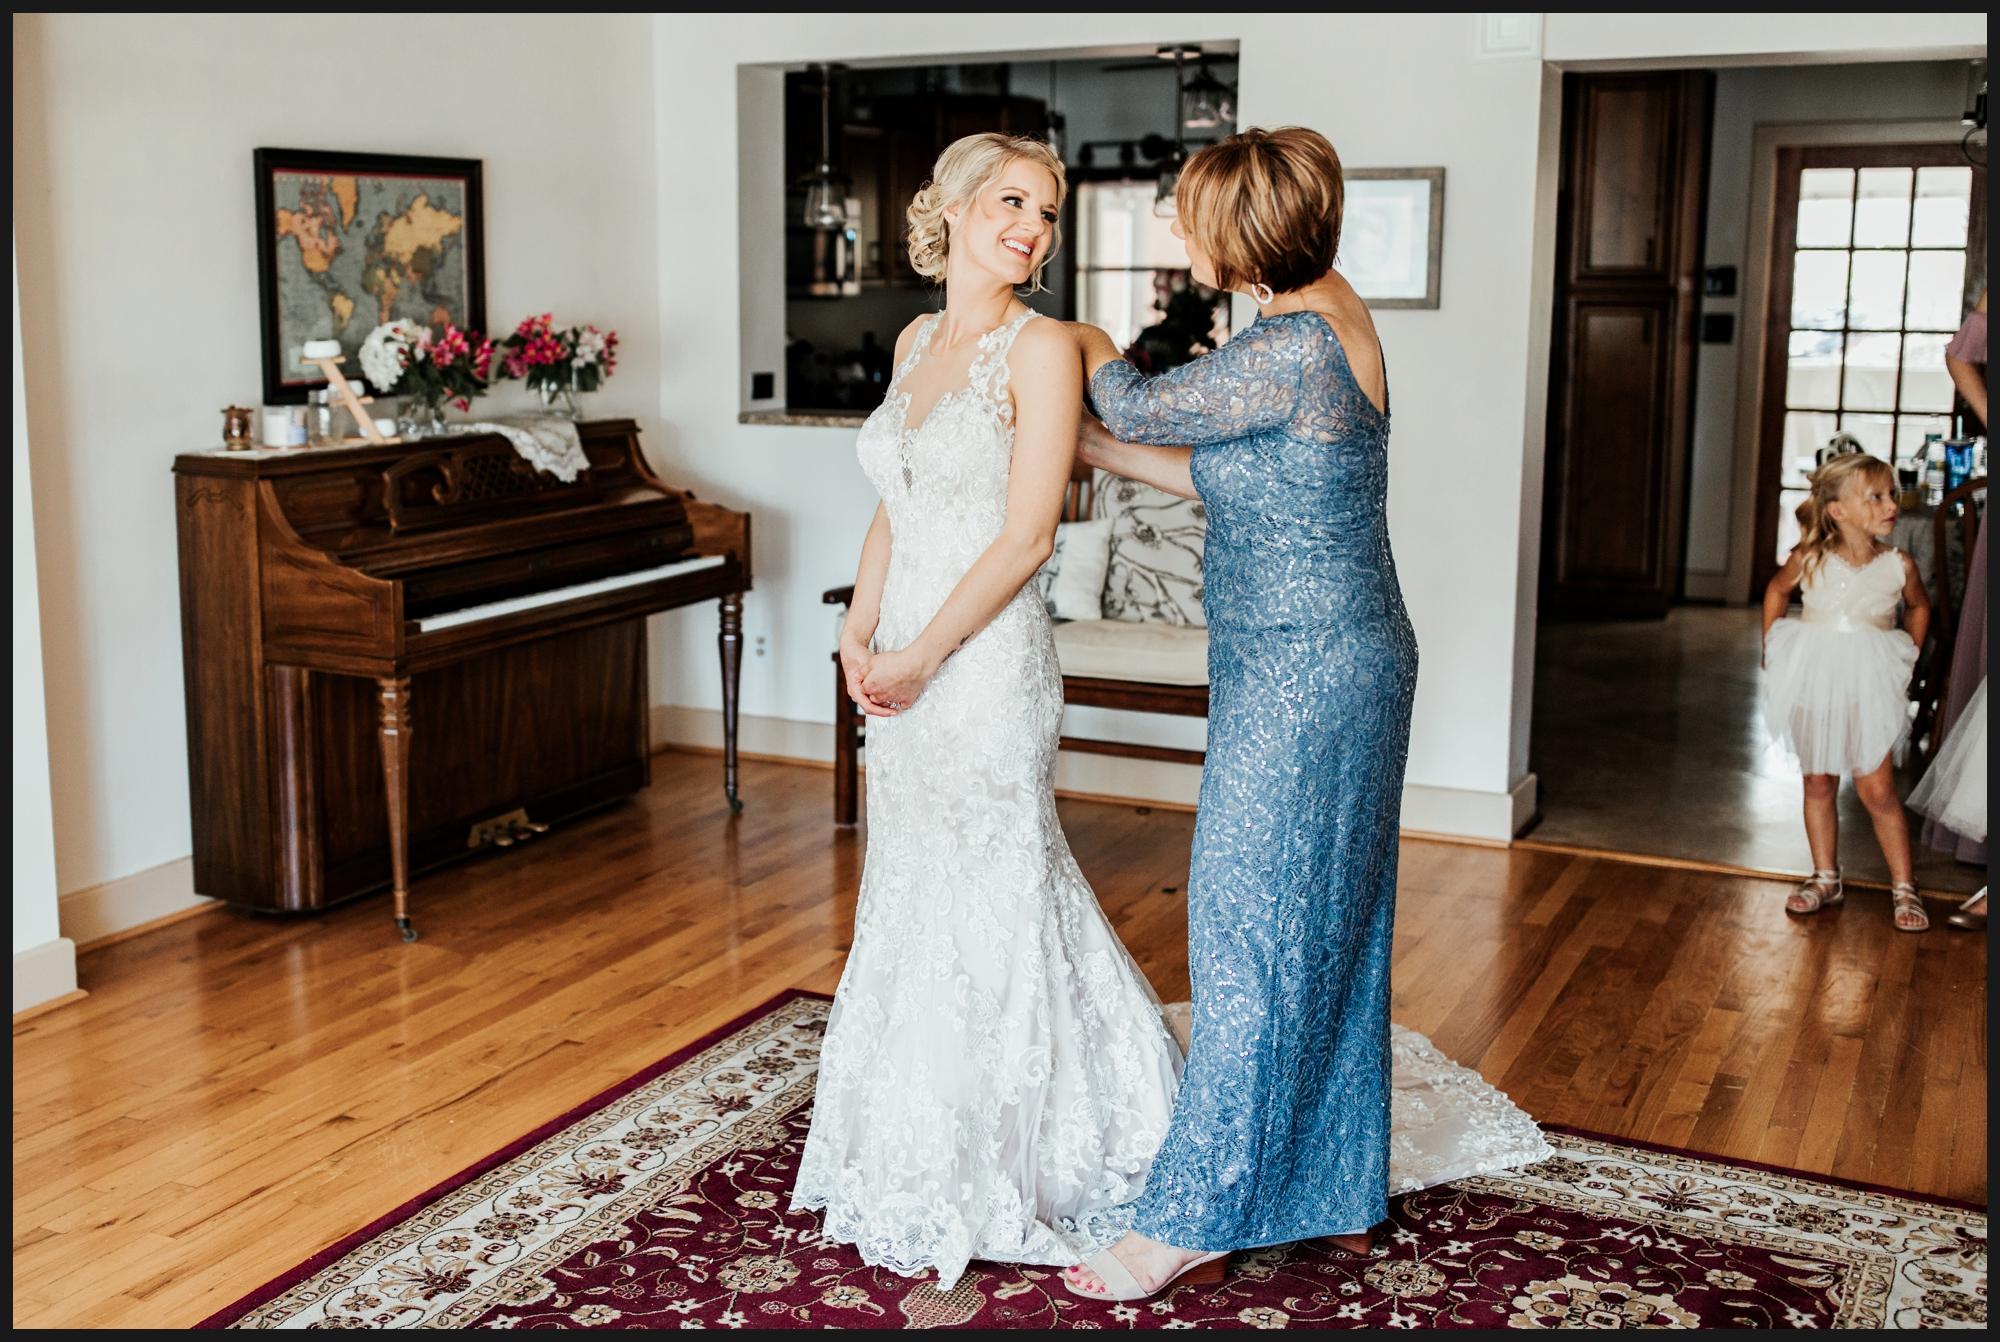 Orlando-Wedding-Photographer-destination-wedding-photographer-florida-wedding-photographer-hawaii-wedding-photographer_0562.jpg